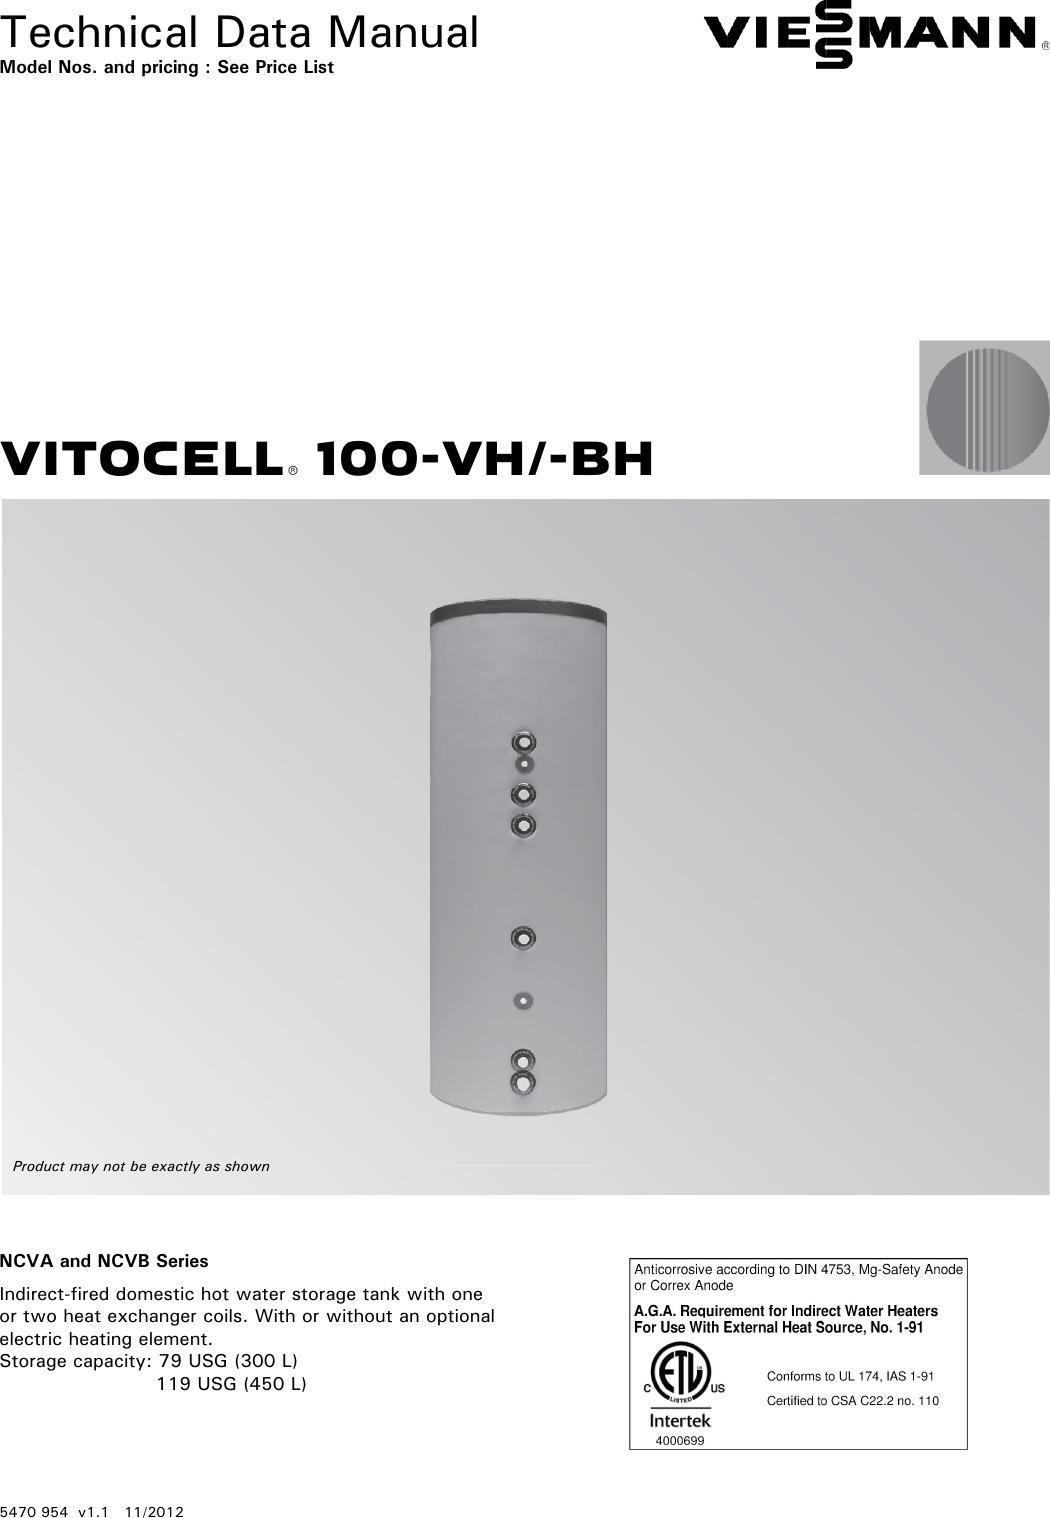 Viessmann Vitocell 100 Vh Bh Technical Manual 5470 954 V1 1